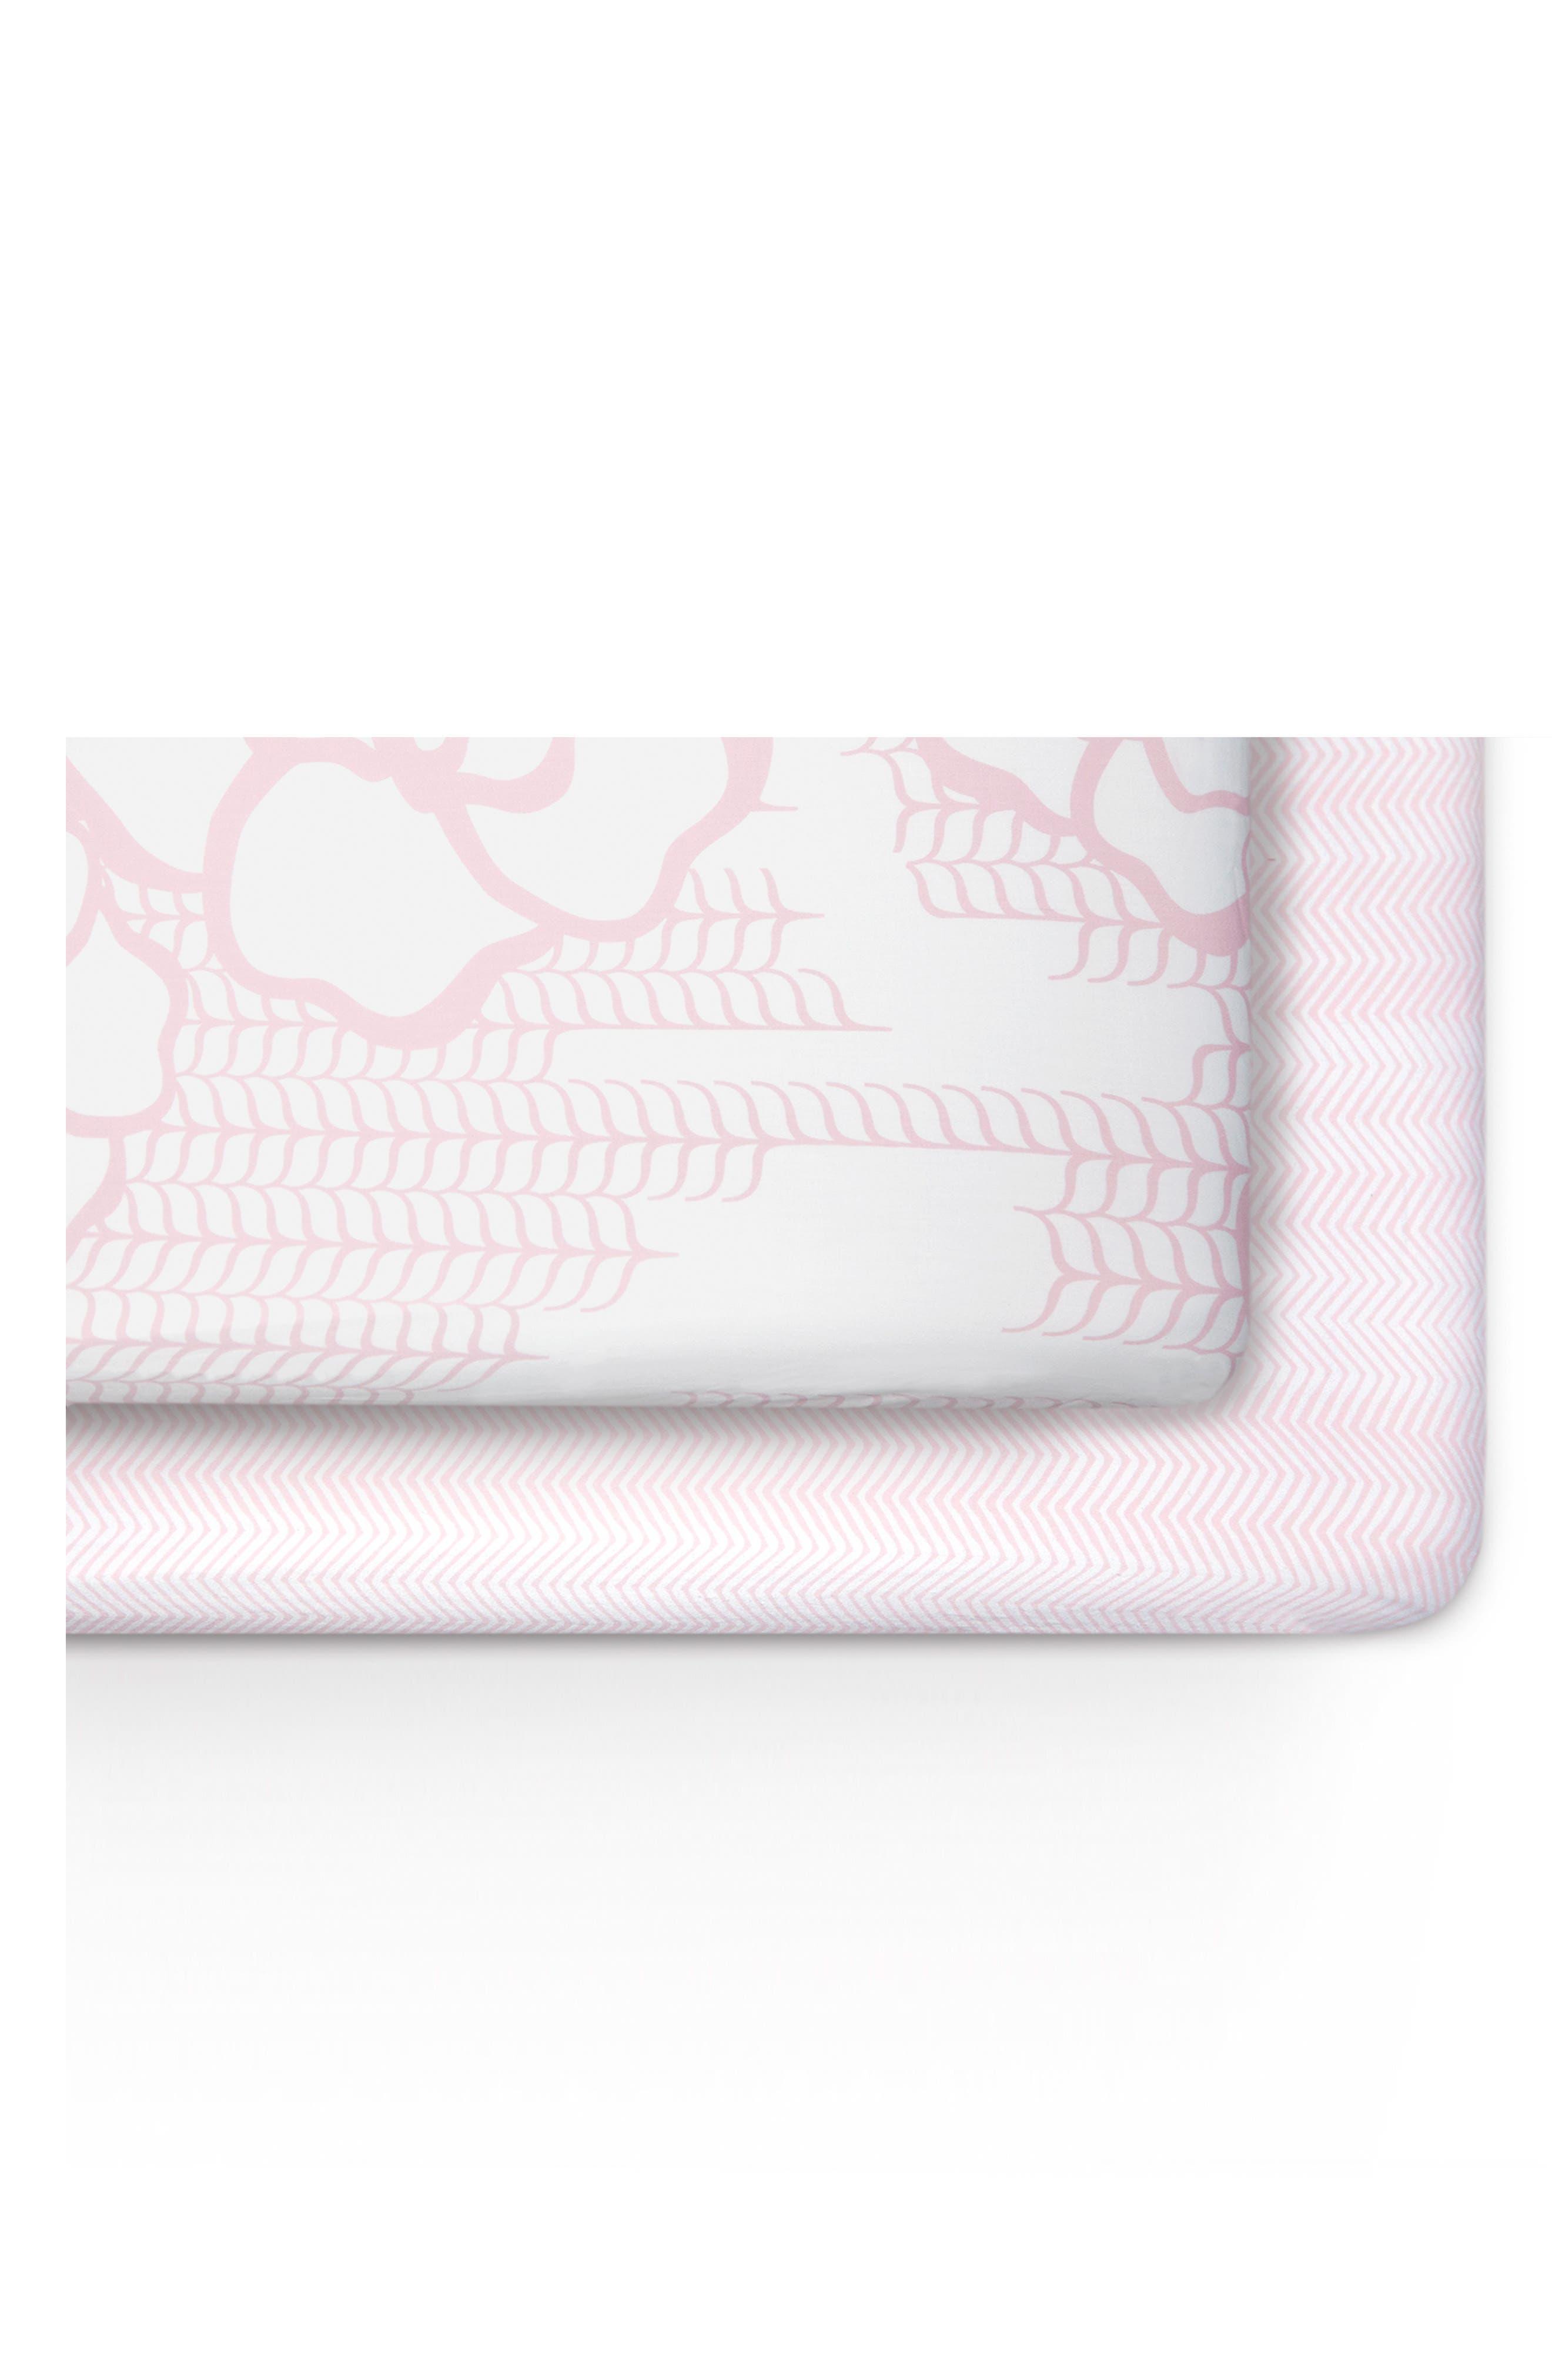 Capri & Zigzag 2-Pack Jersey Crib Sheets,                         Main,                         color, Capri